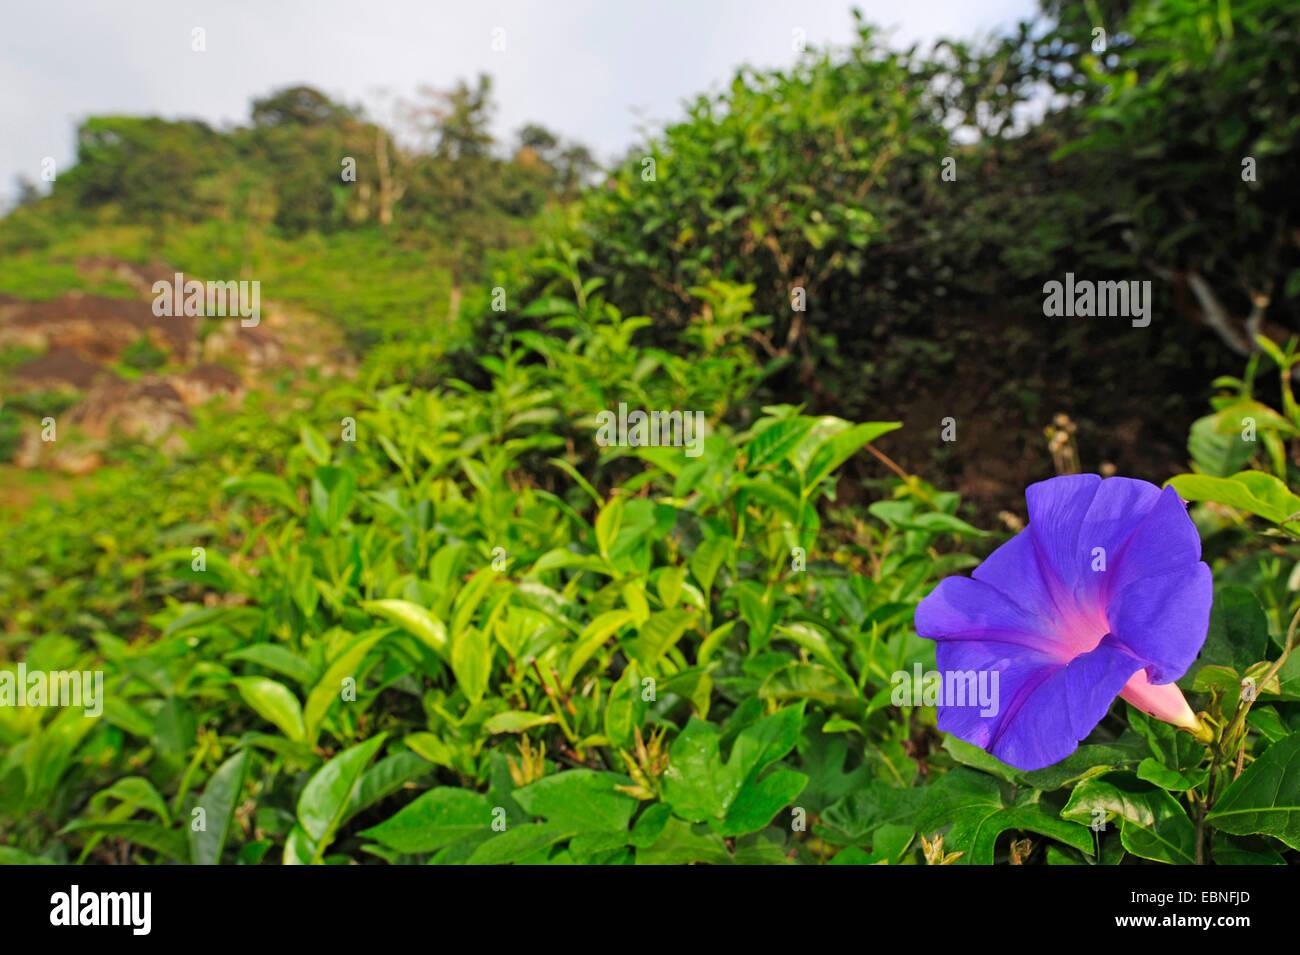 Blue dawn flower oceanblue morning glory blue morning glory stock blue dawn flower oceanblue morning glory blue morning glory ipomoea spec blooming in a tea plantation sri lanka izmirmasajfo